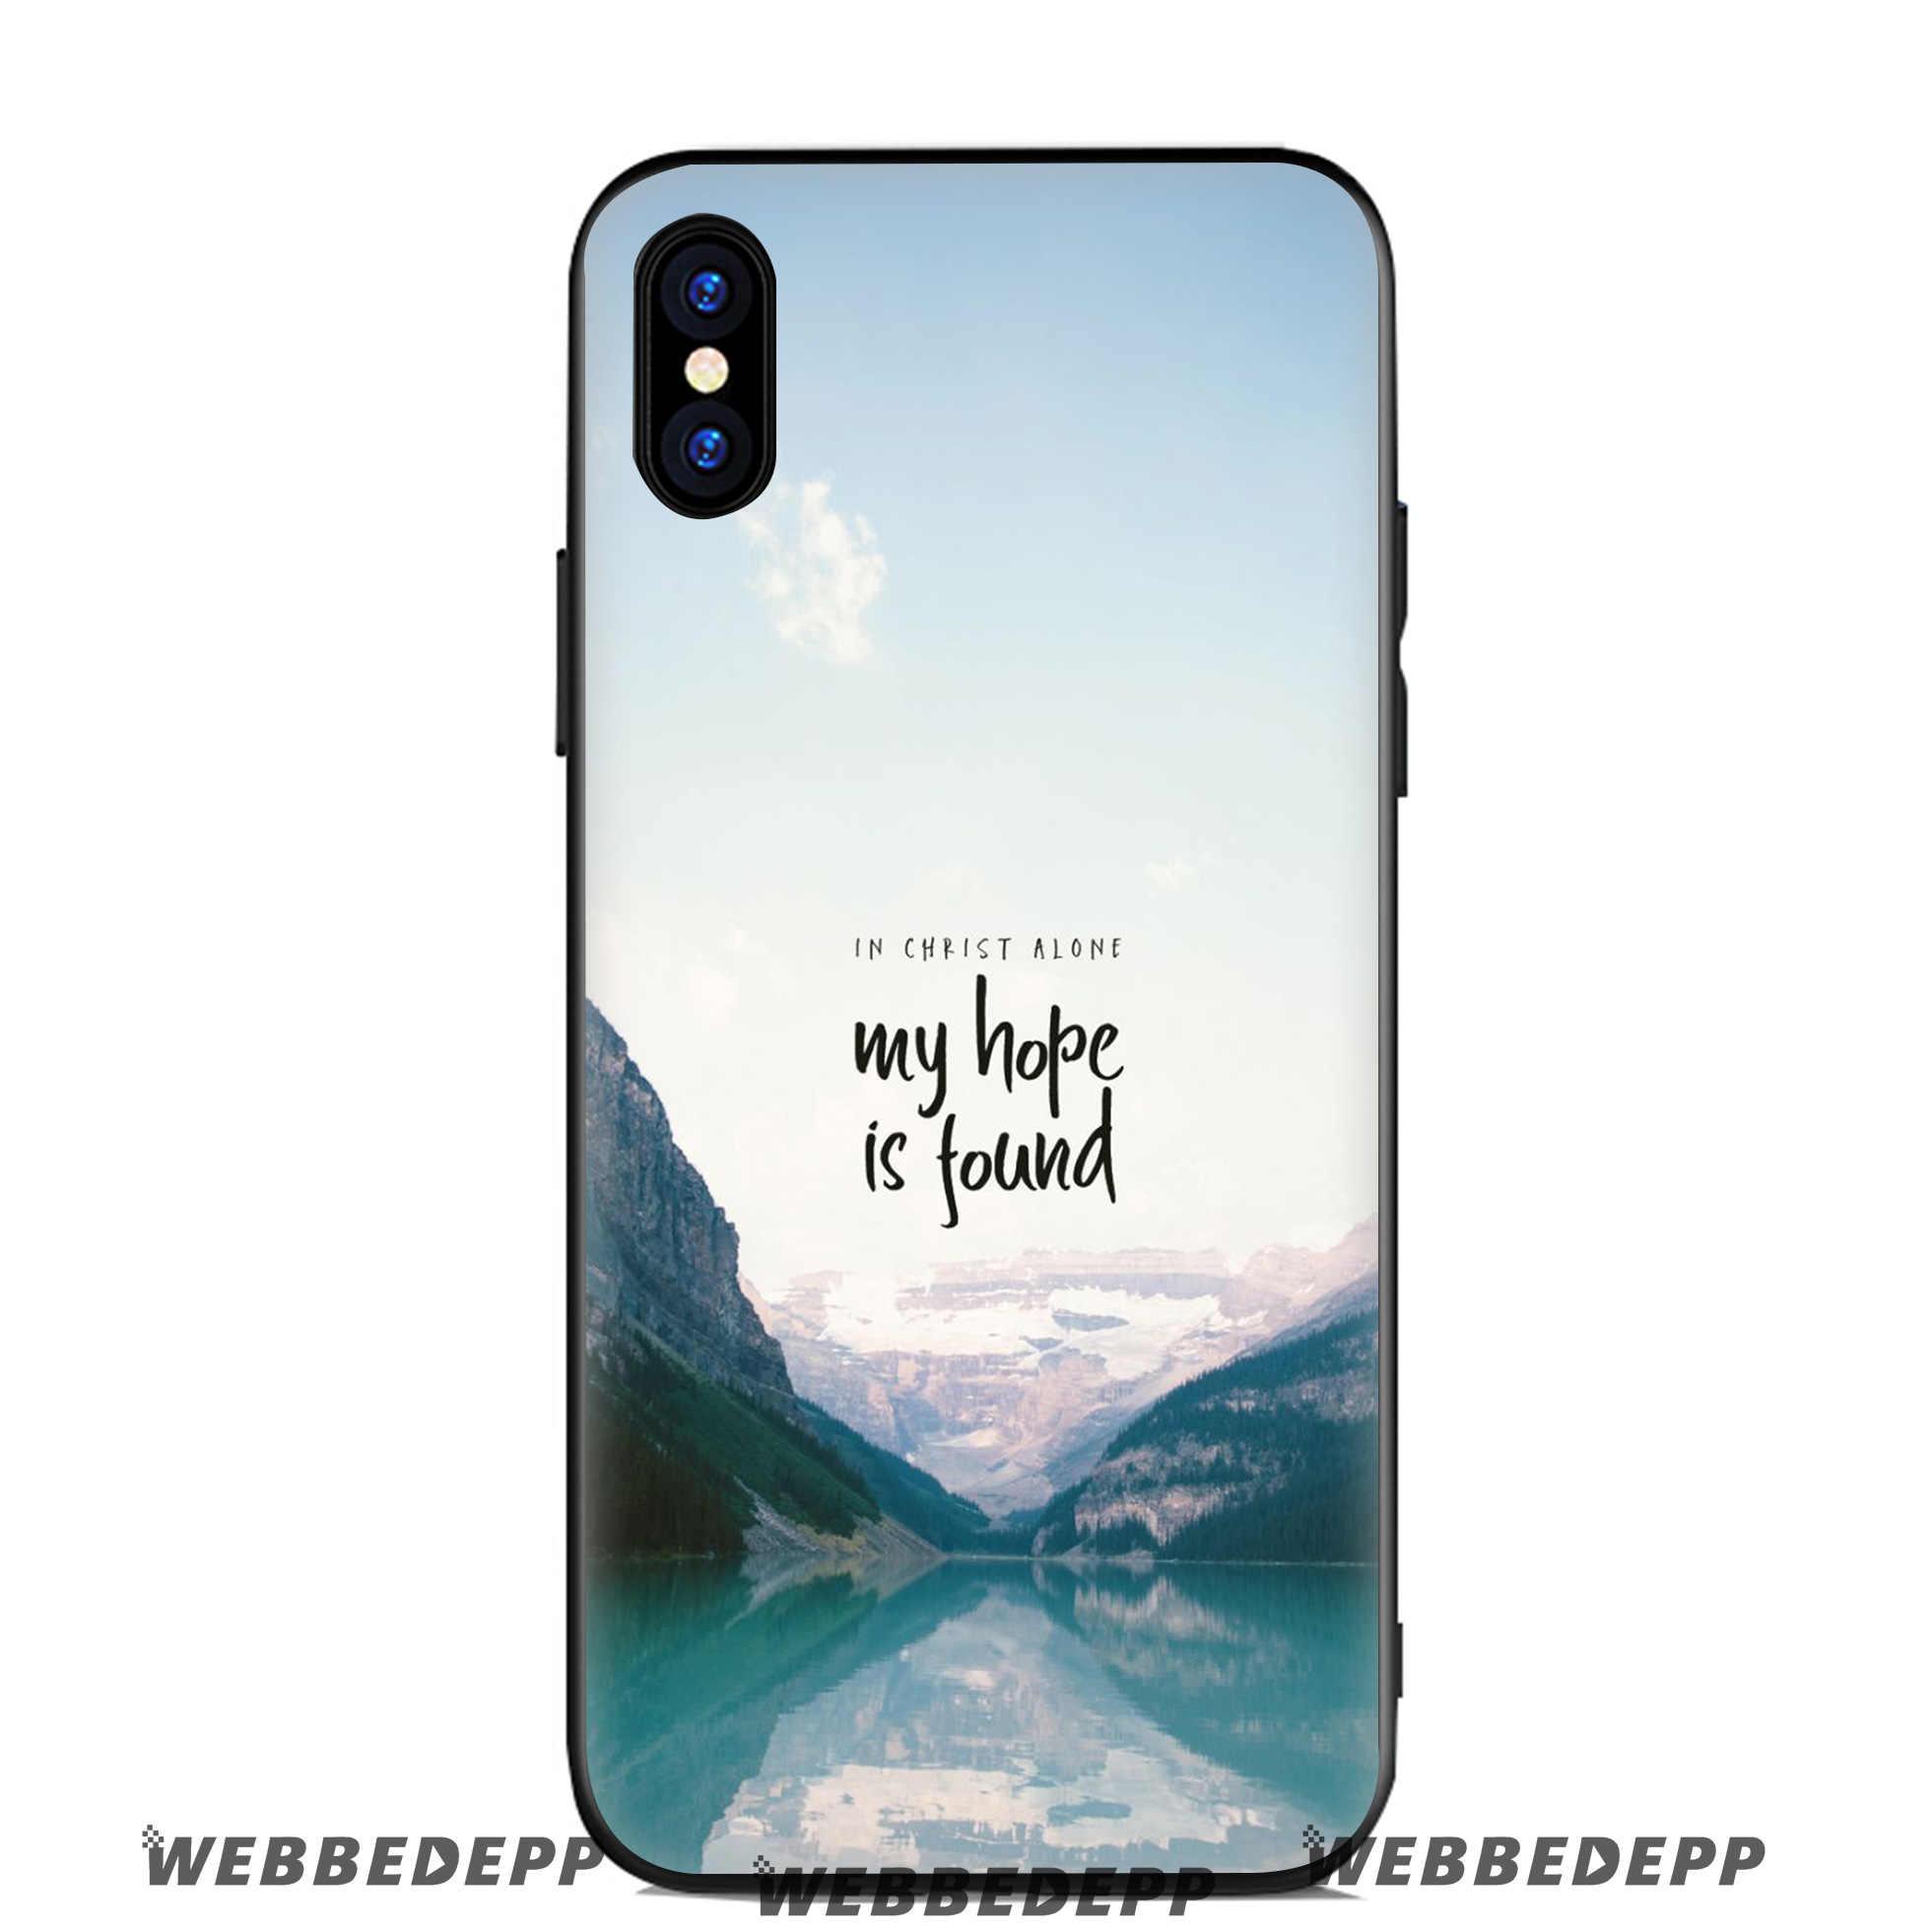 Webbedepp Ayat Alkitab Yesus Kasus Silicone Lembut untuk Apple iPhone 11 Pro XR X Max X atau 10 8 7 6 6S PLUS 5 5S SE TPU